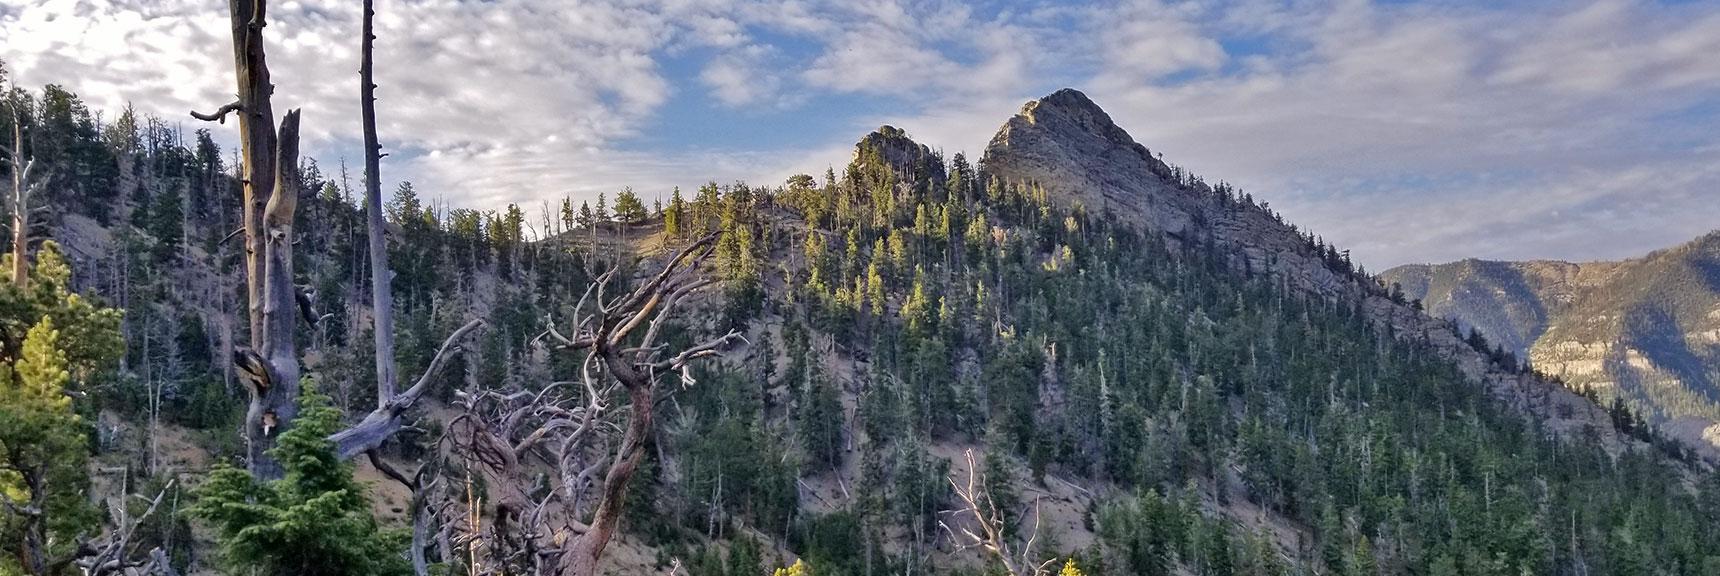 West Side of Cockscomb Ridge on North Loop Trail to Mummy Mountain's Knees | Mummy Mountain's Knees | Mt. Charleston Wilderness, Nevada 001